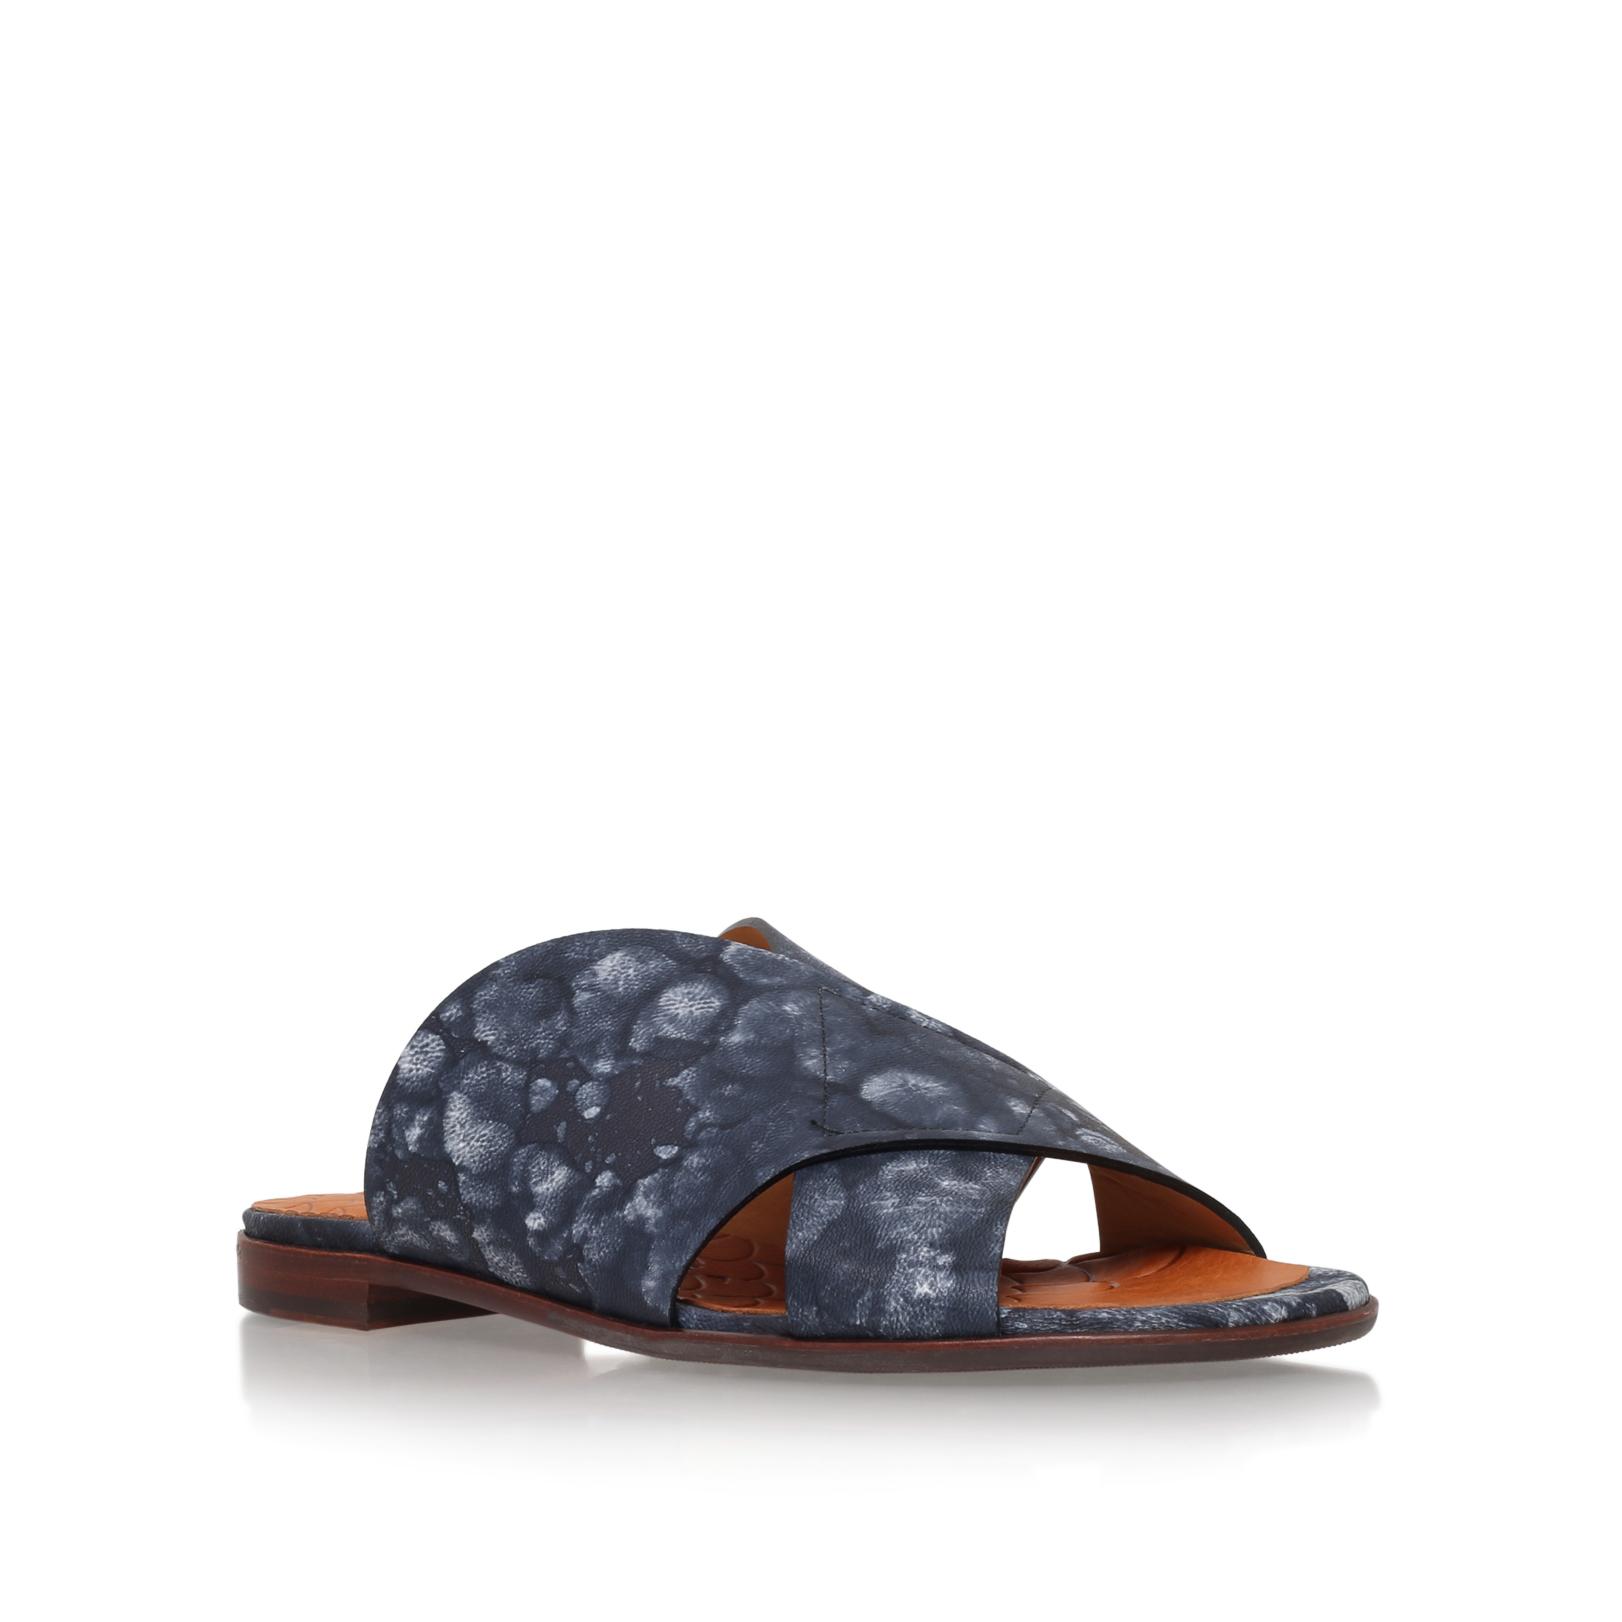 Mihara Sandals Mihara Chie Chie Flat Mihara Flat Chie Mihara Chie Flat Sandals Sandals SUMpVz